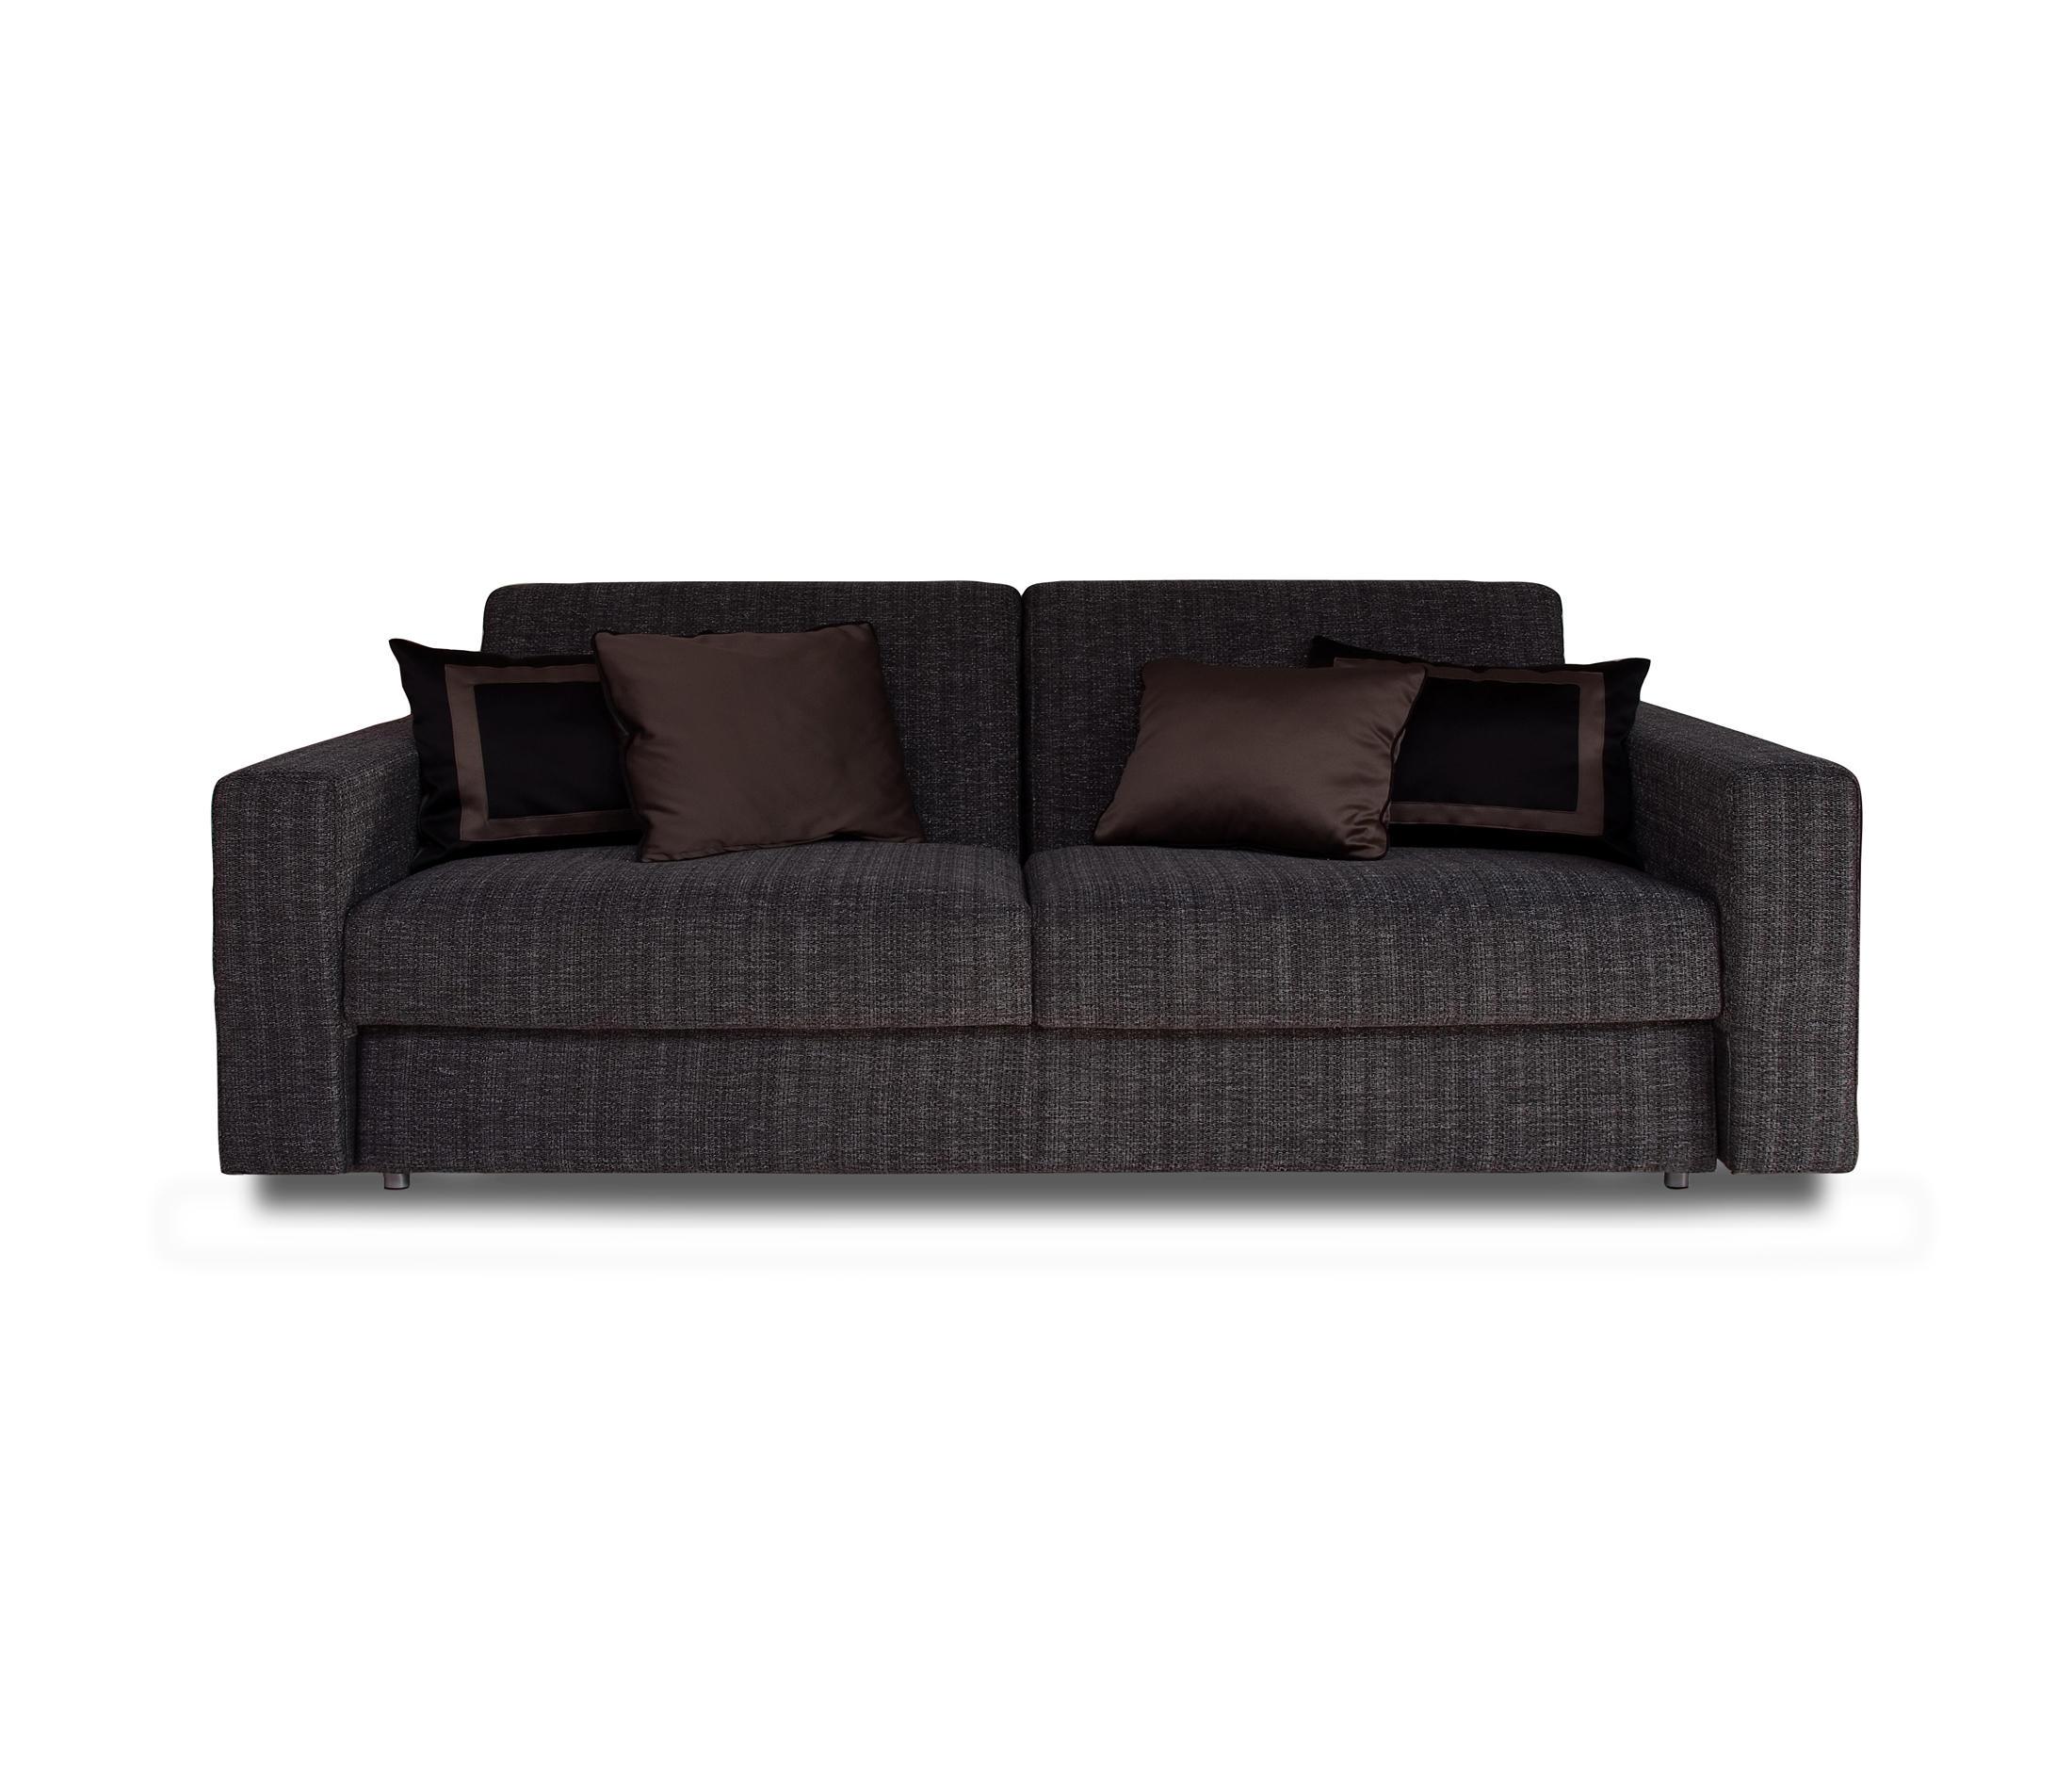 Seneca Möbel seneca sofa schlafsofas grassoler architonic